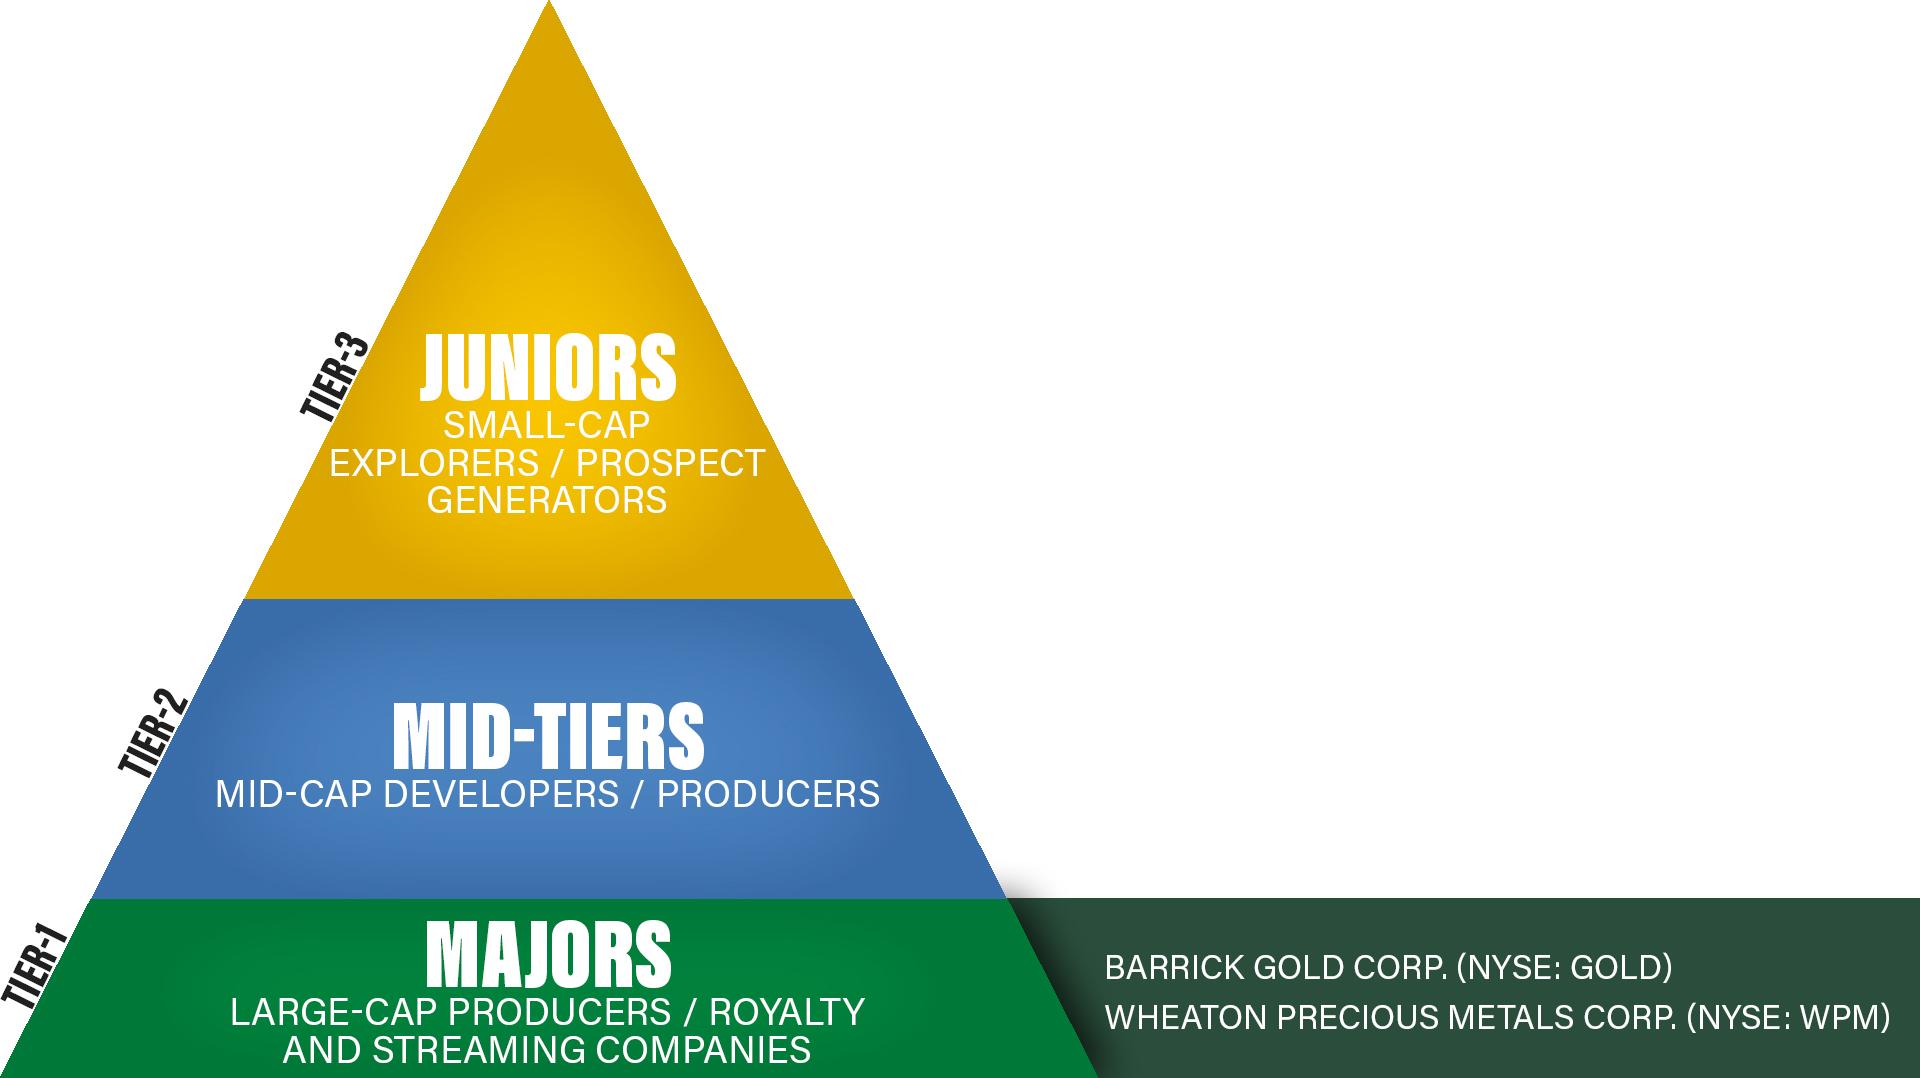 pyramid-barrick-wheaton